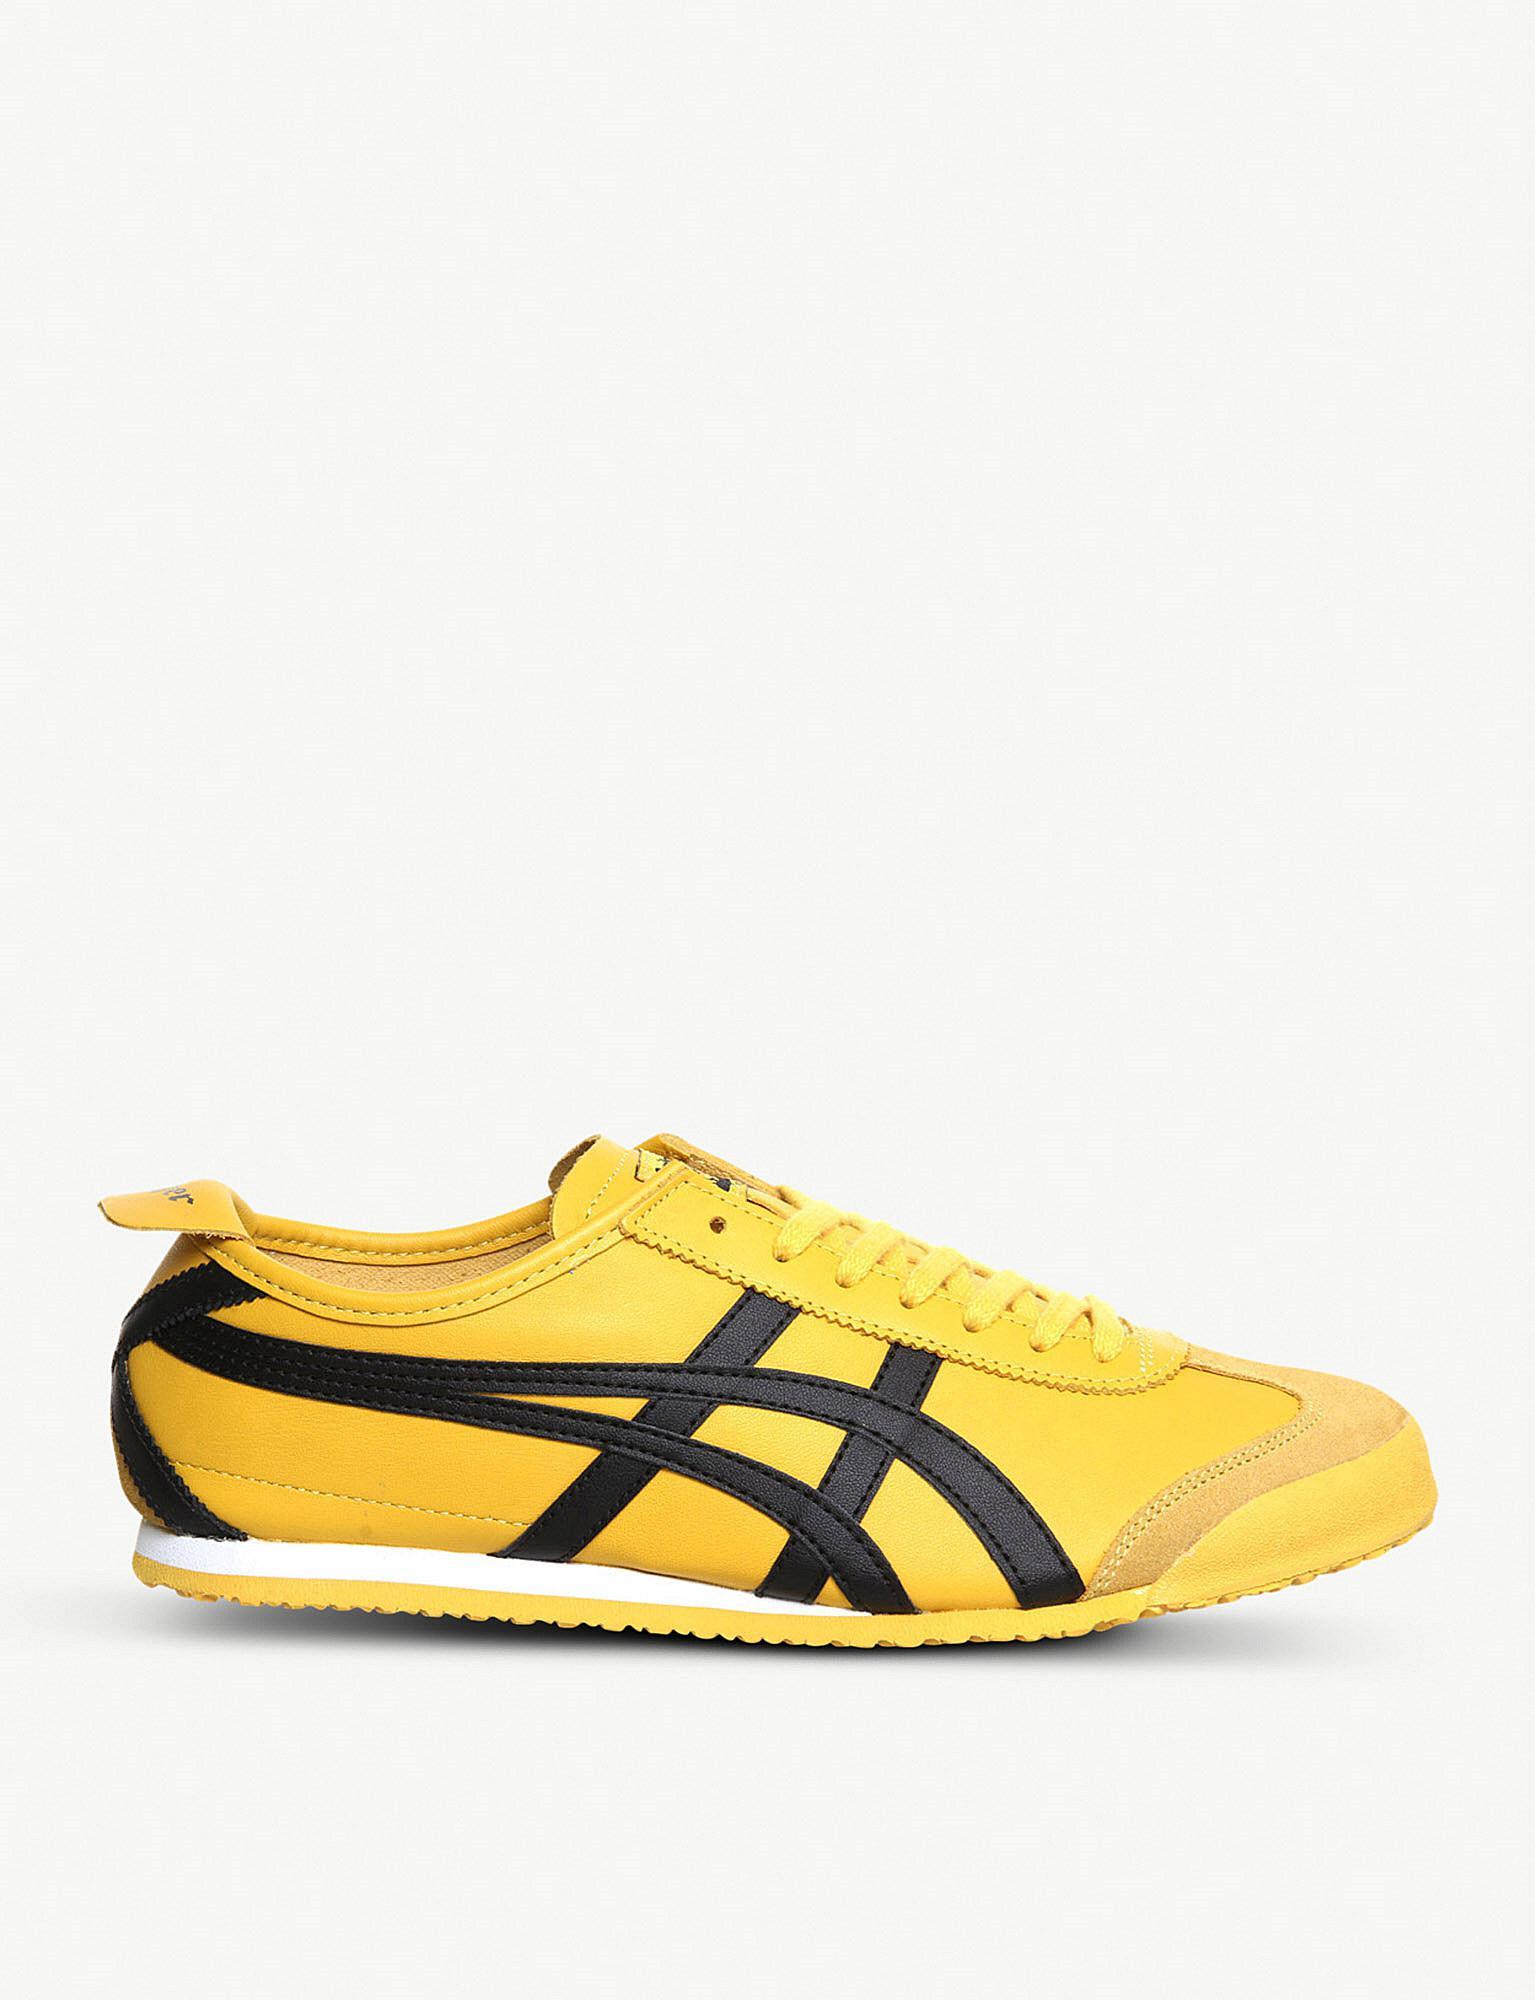 separation shoes 3823e 9e51e Asics. Women s Yellow Mexico 66 Leather Trainers